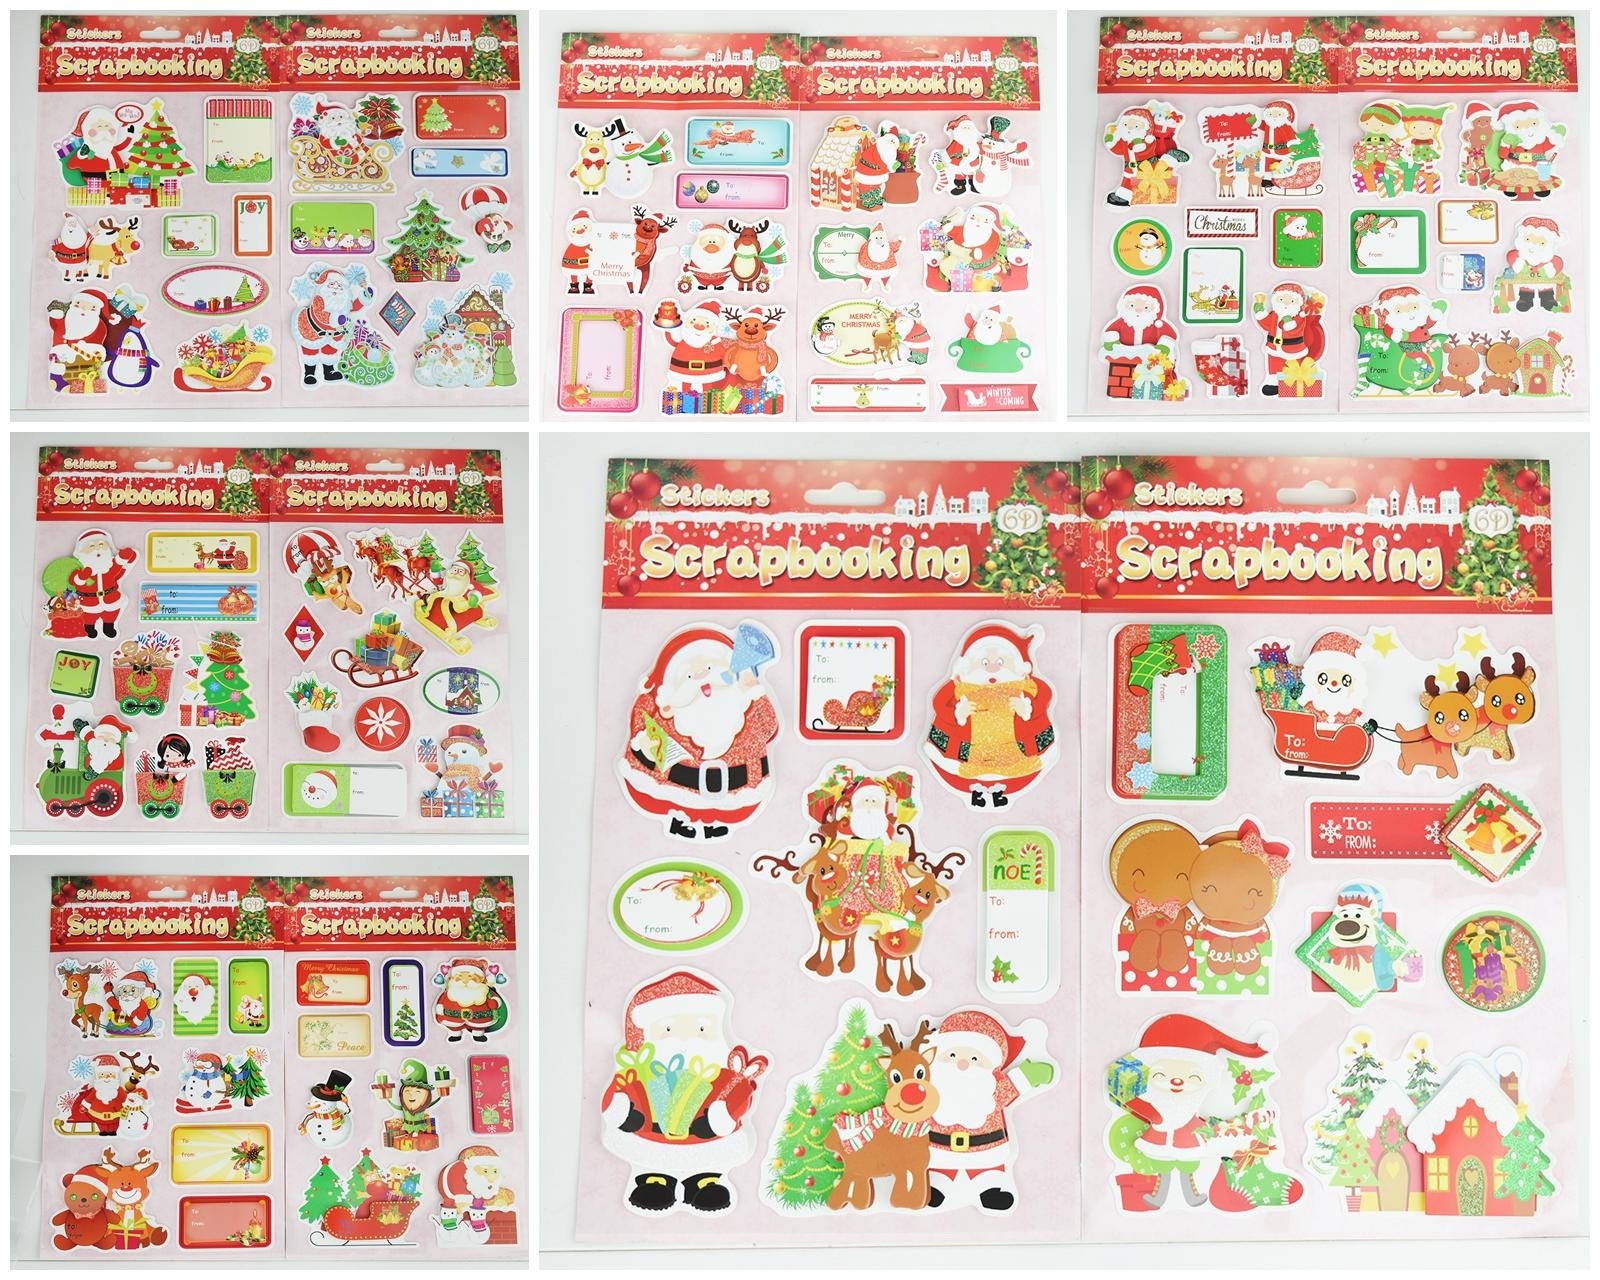 X射線【X389832】金粉立體聖誕貼,聖誕節/貼紙/聖誕佈置/聖誕造景/聖誕裝飾/玻璃貼/姓名貼/壁貼/靜電貼